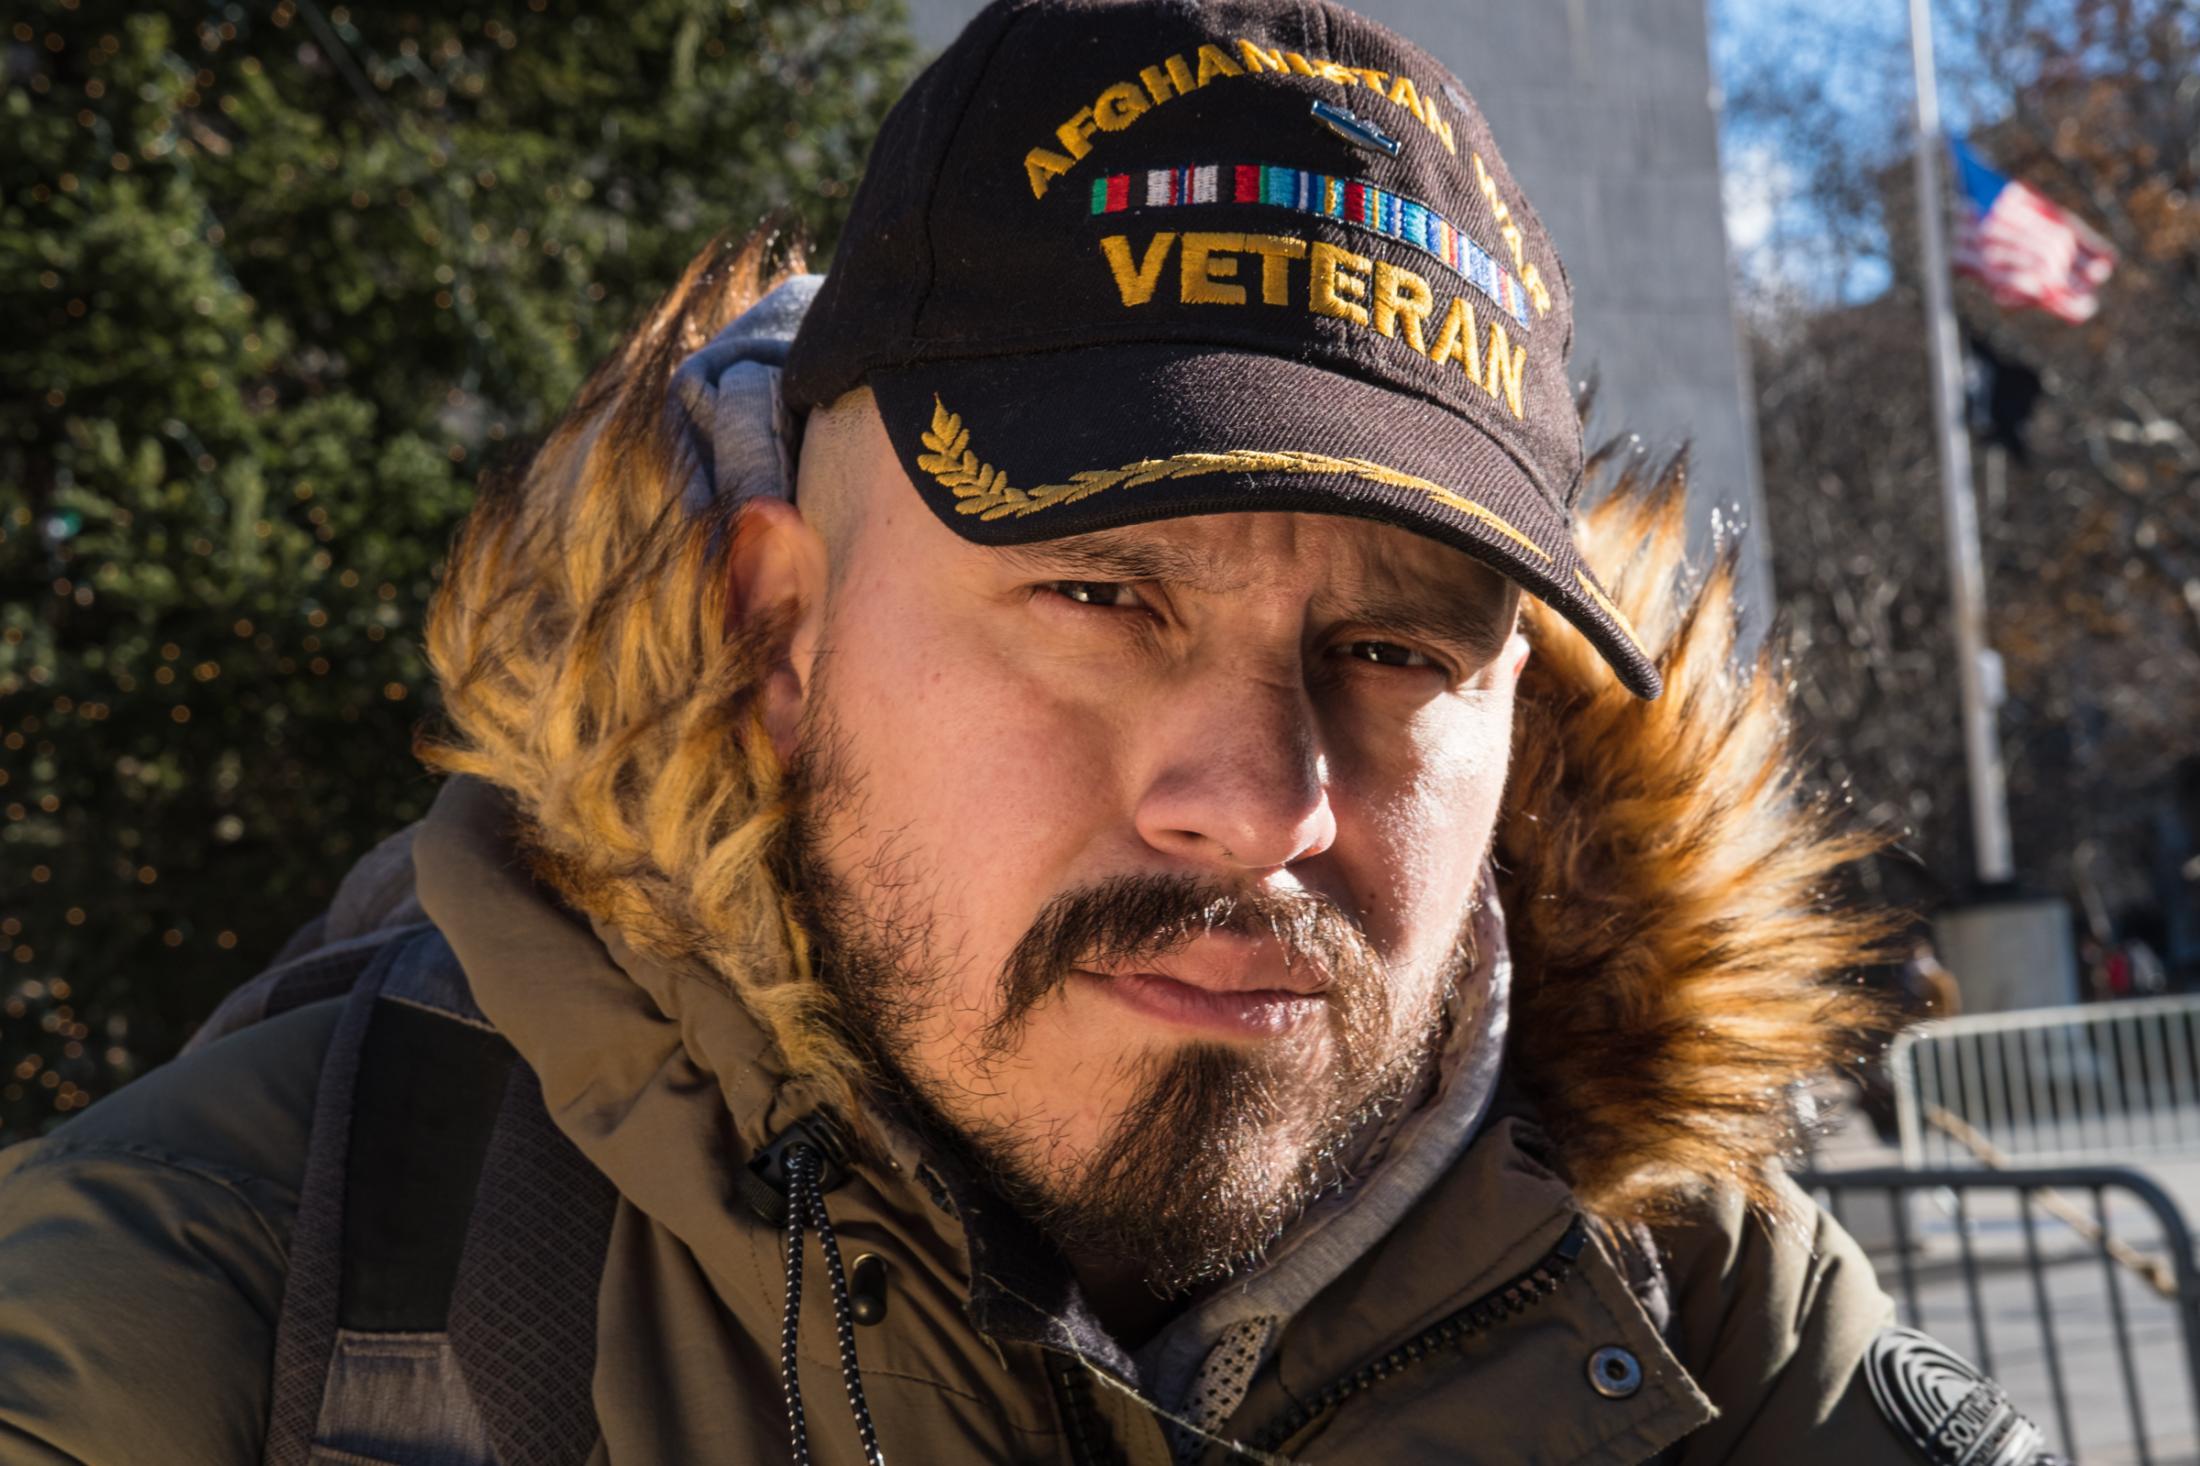 Washington Square Park, New York University, NY. December 7, 2018. James Barbosa at Washington Square Park.